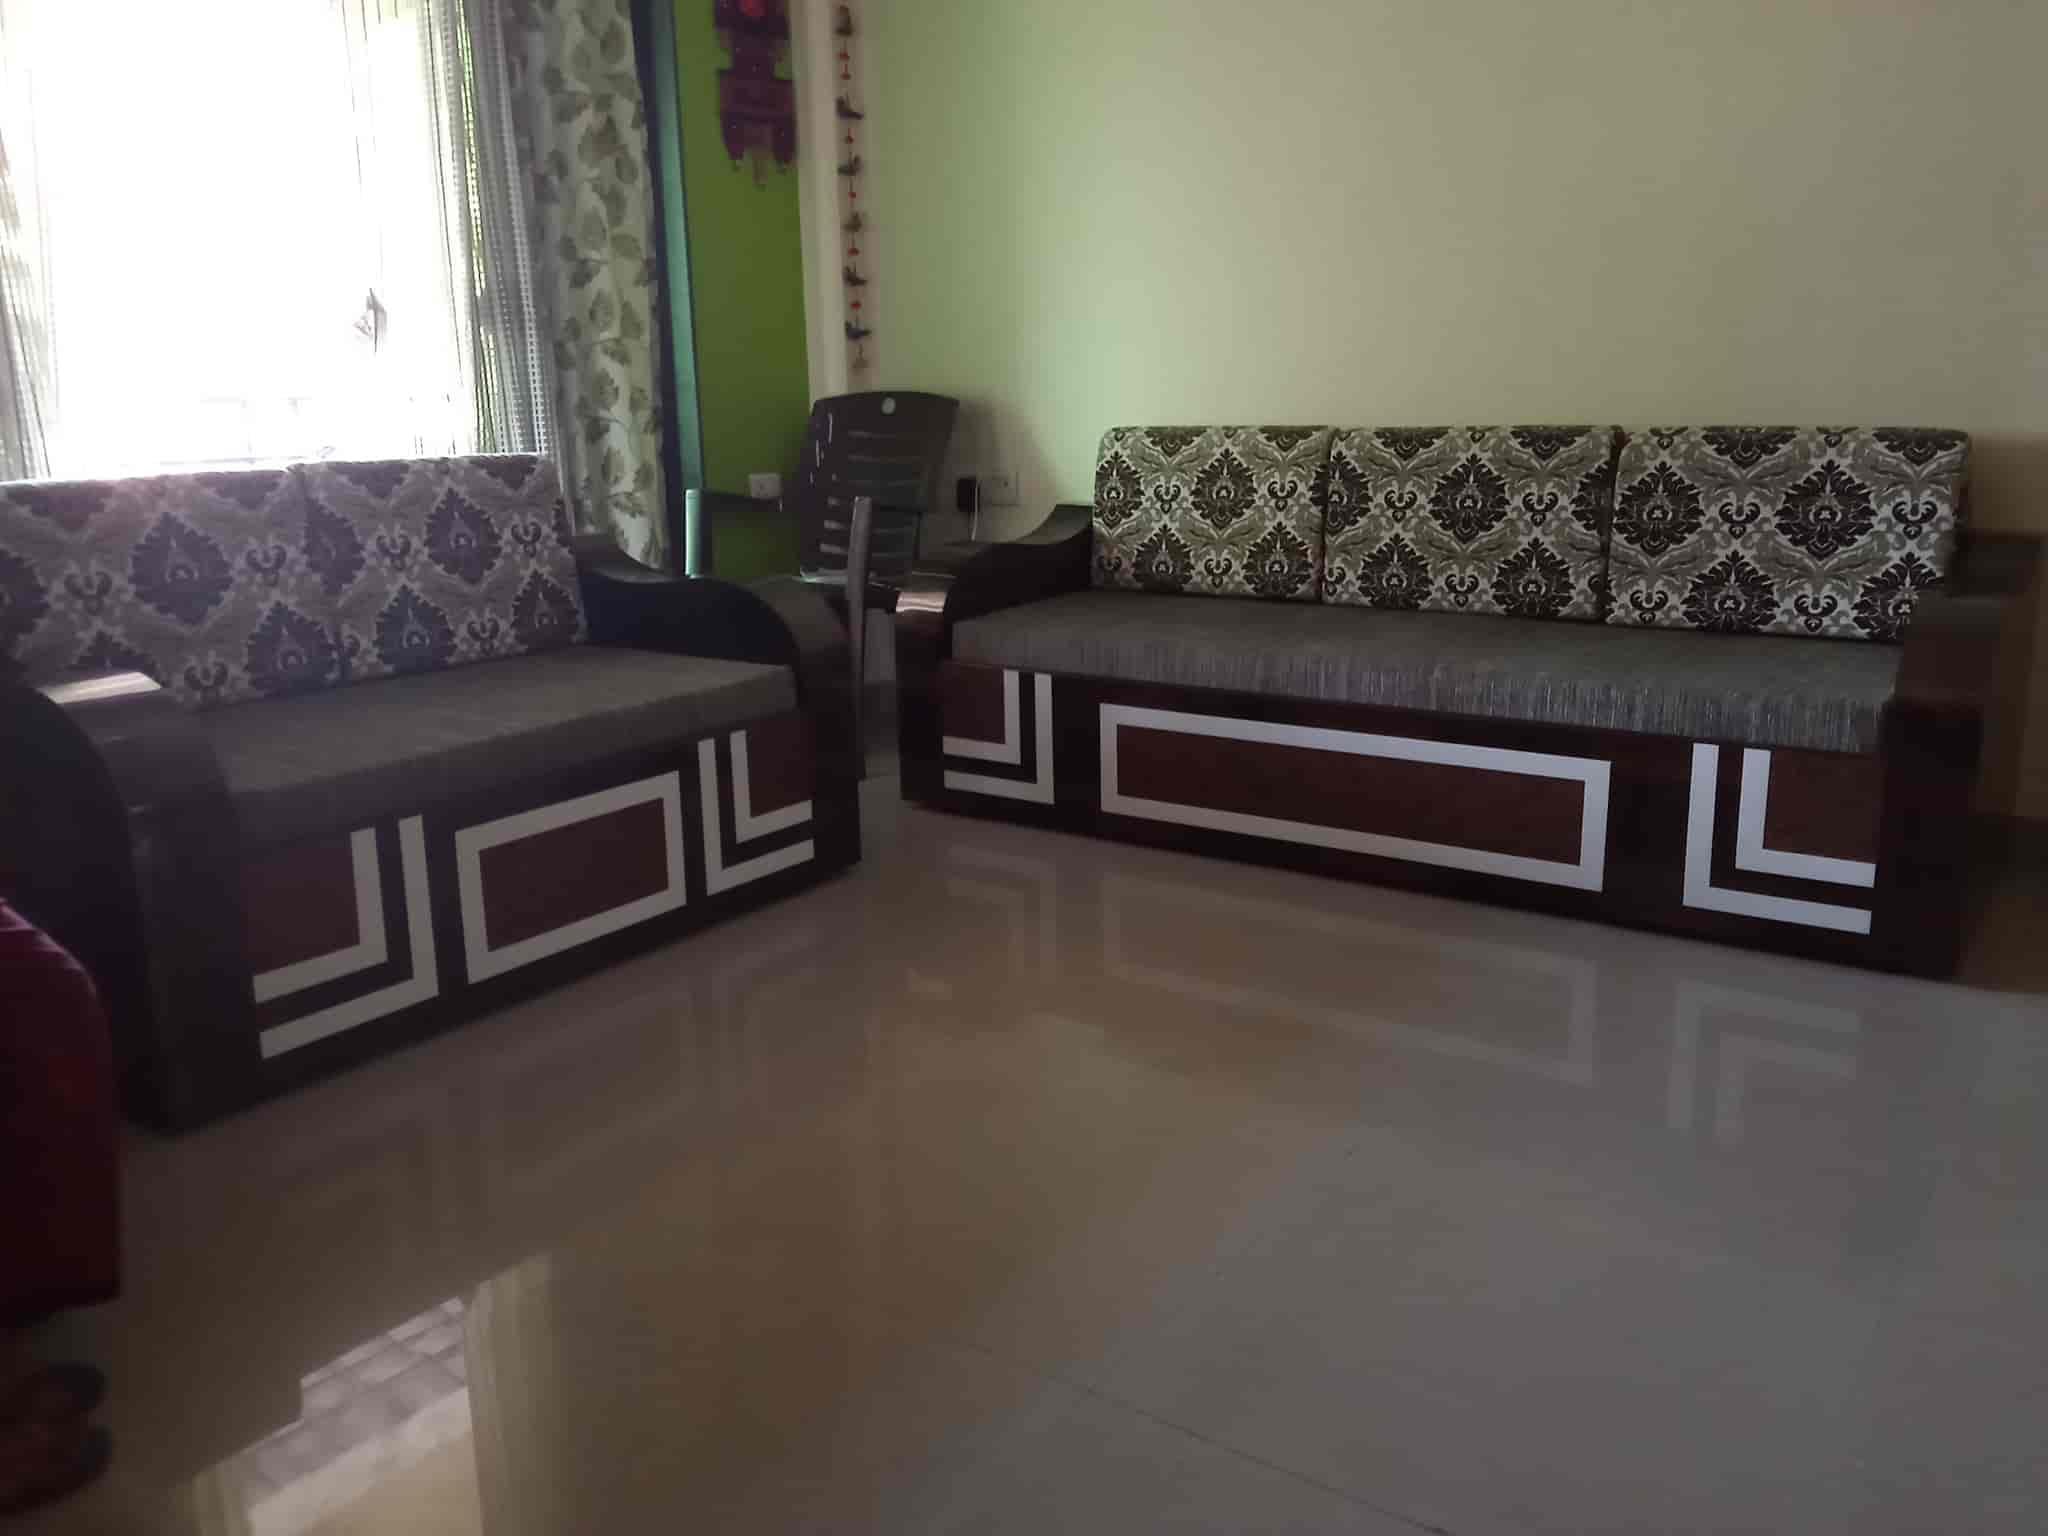 Maharashtra Furniture, Kamothe - Furniture Dealers In Navi Mumbai, Mumbai - Justdial